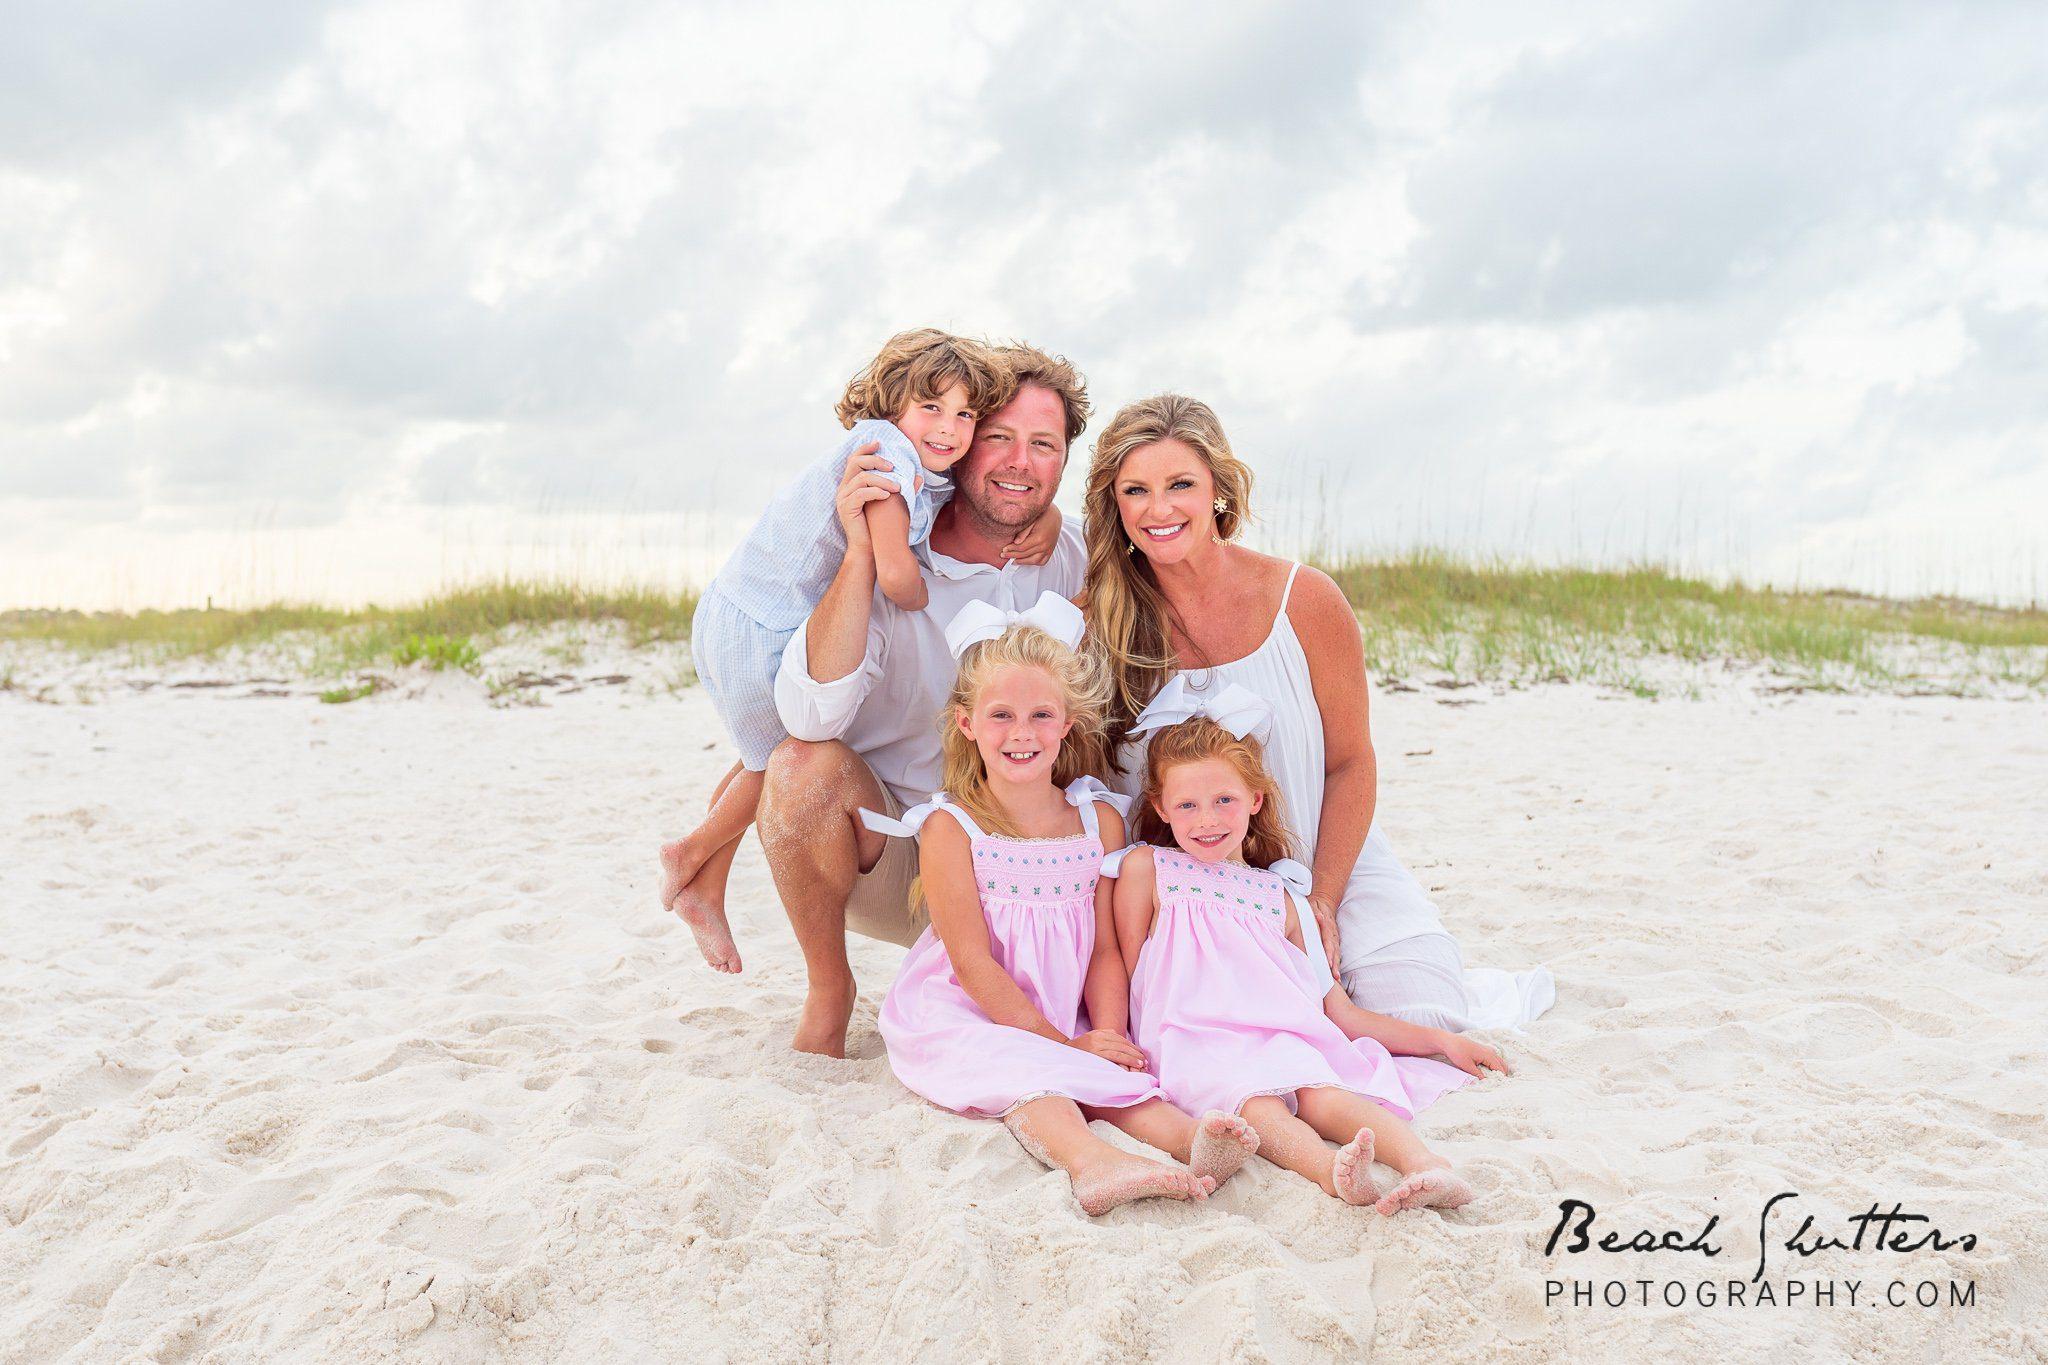 Orange Beach photographers Beach Shutters Photography